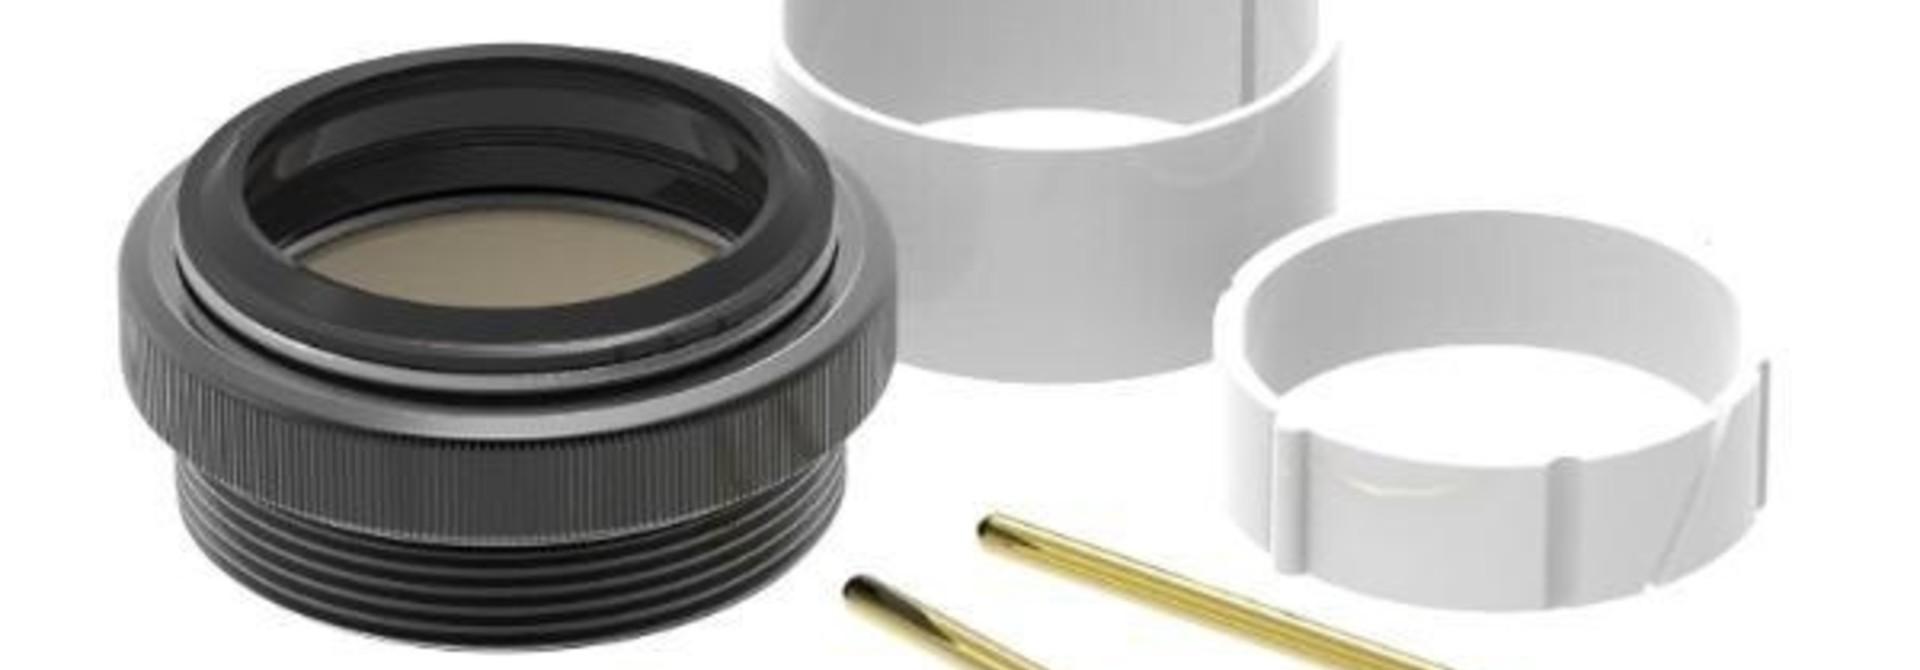 OneUp Dropper Rebuild Kit V2